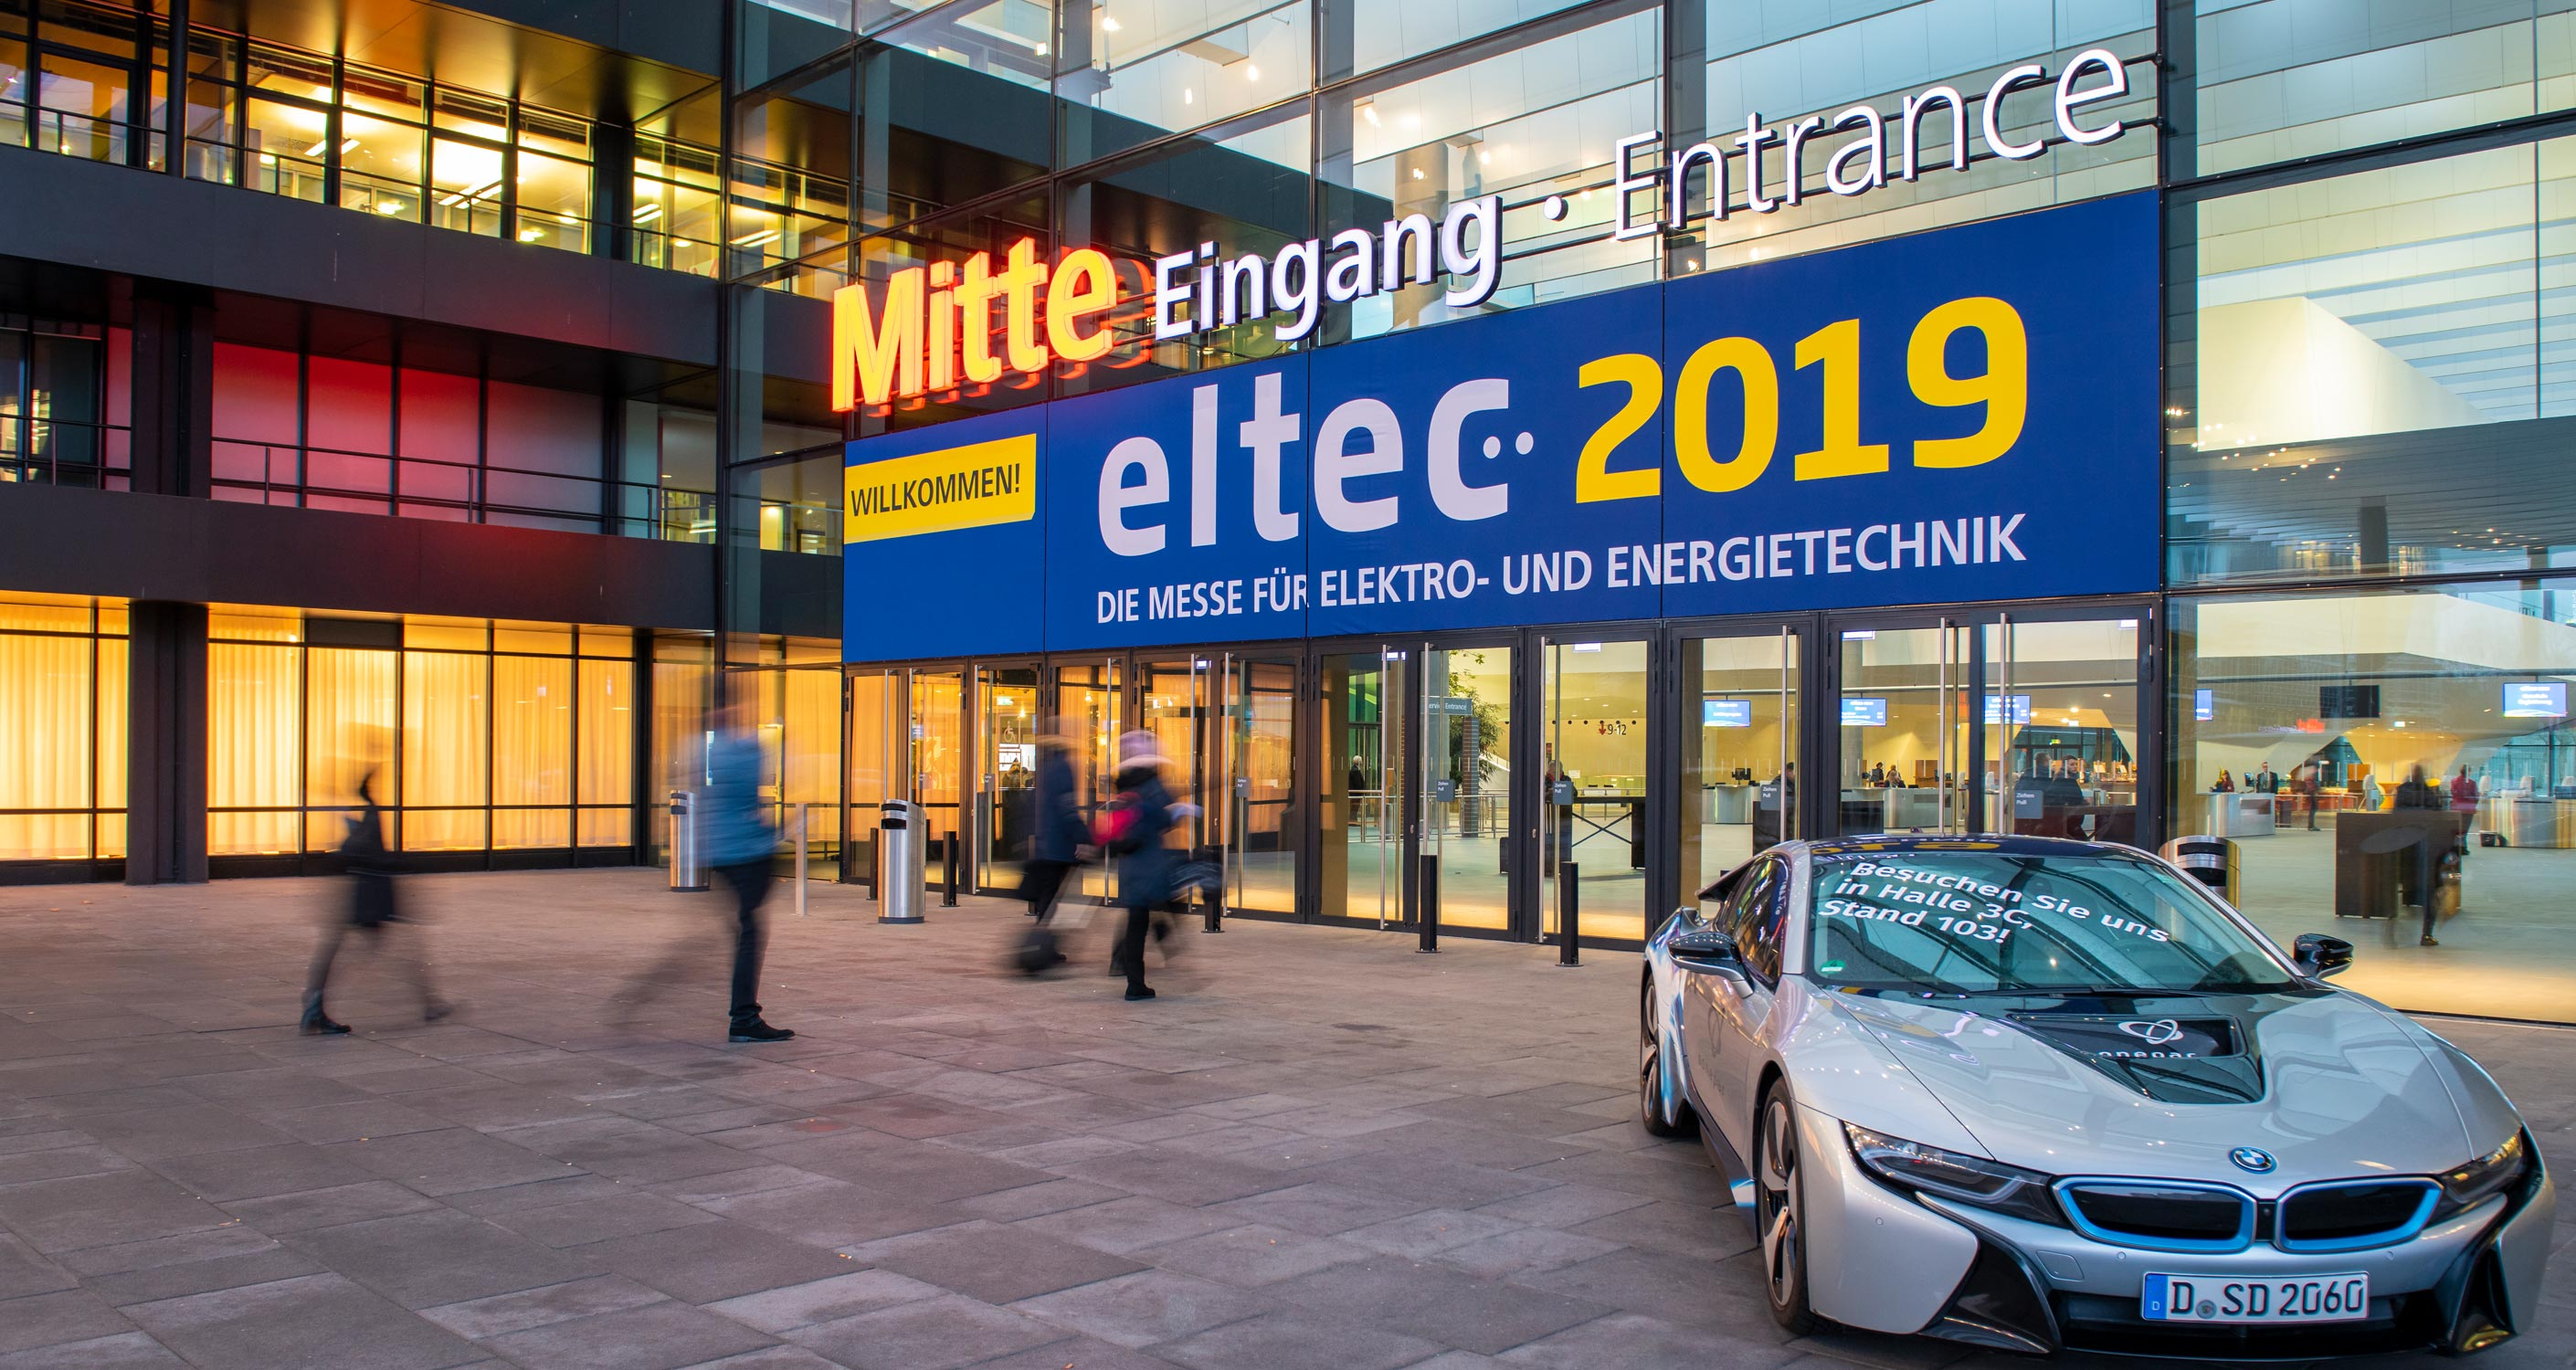 Rückblick eltec 2019 - Eingang Mitte